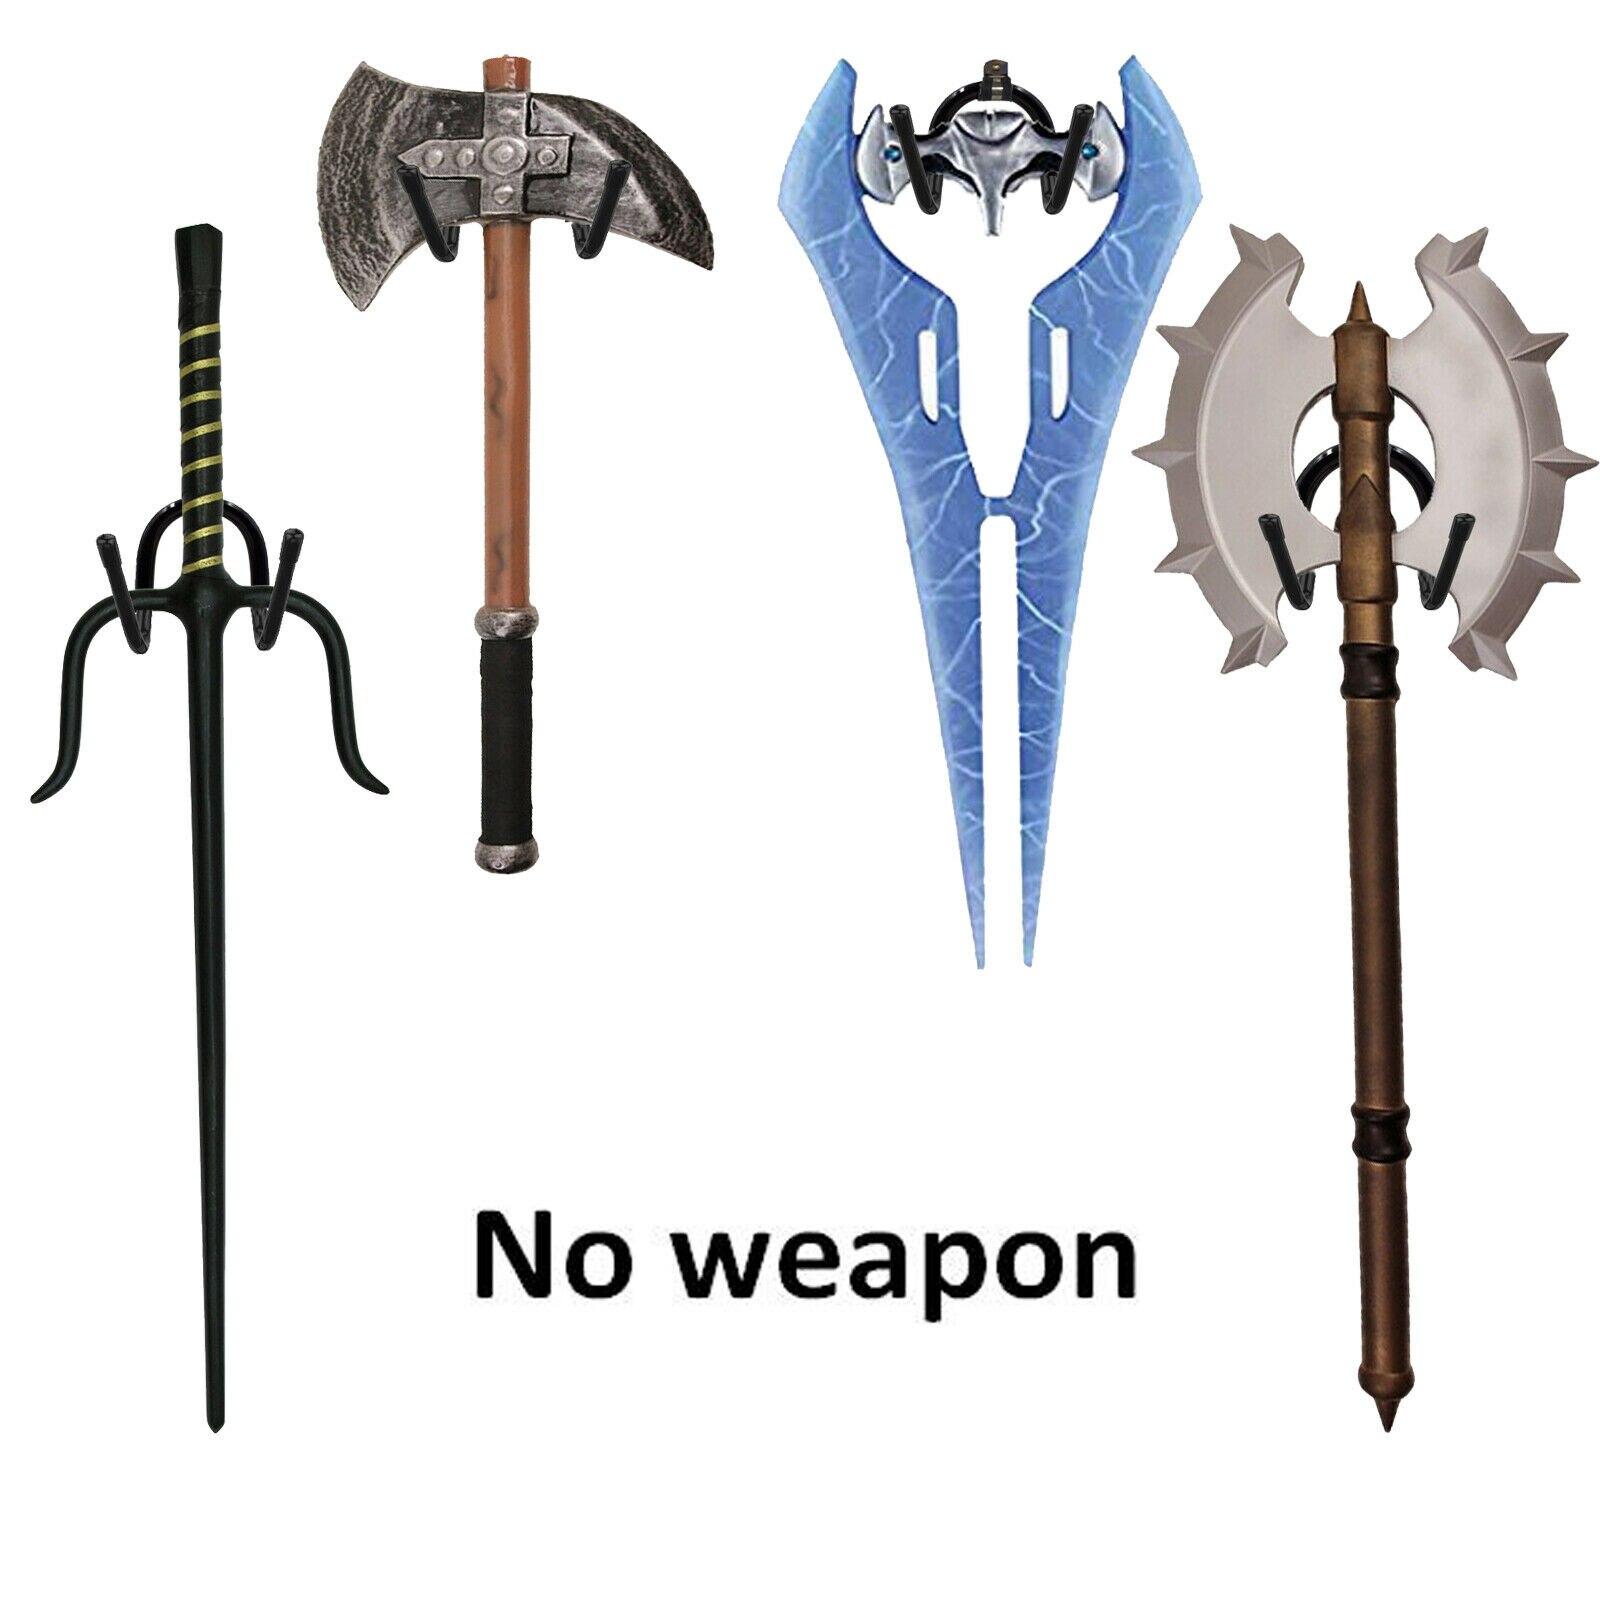 Universal Sword Stand Display Hanger Wall Rack for Sword,Dagger,Axe,Keyblade,etc